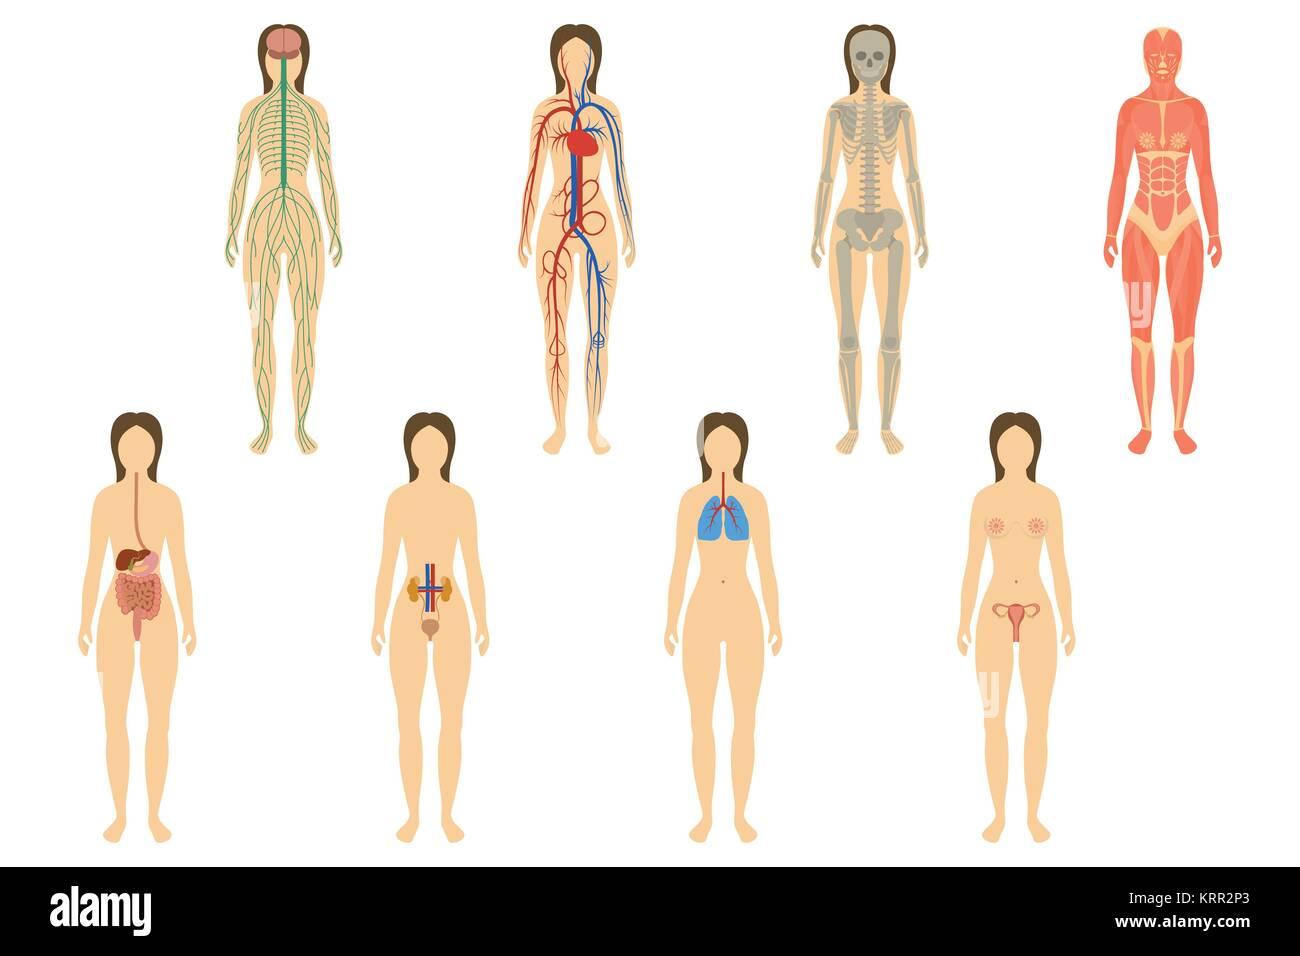 Respiratory Systems Stockfotos & Respiratory Systems Bilder - Alamy